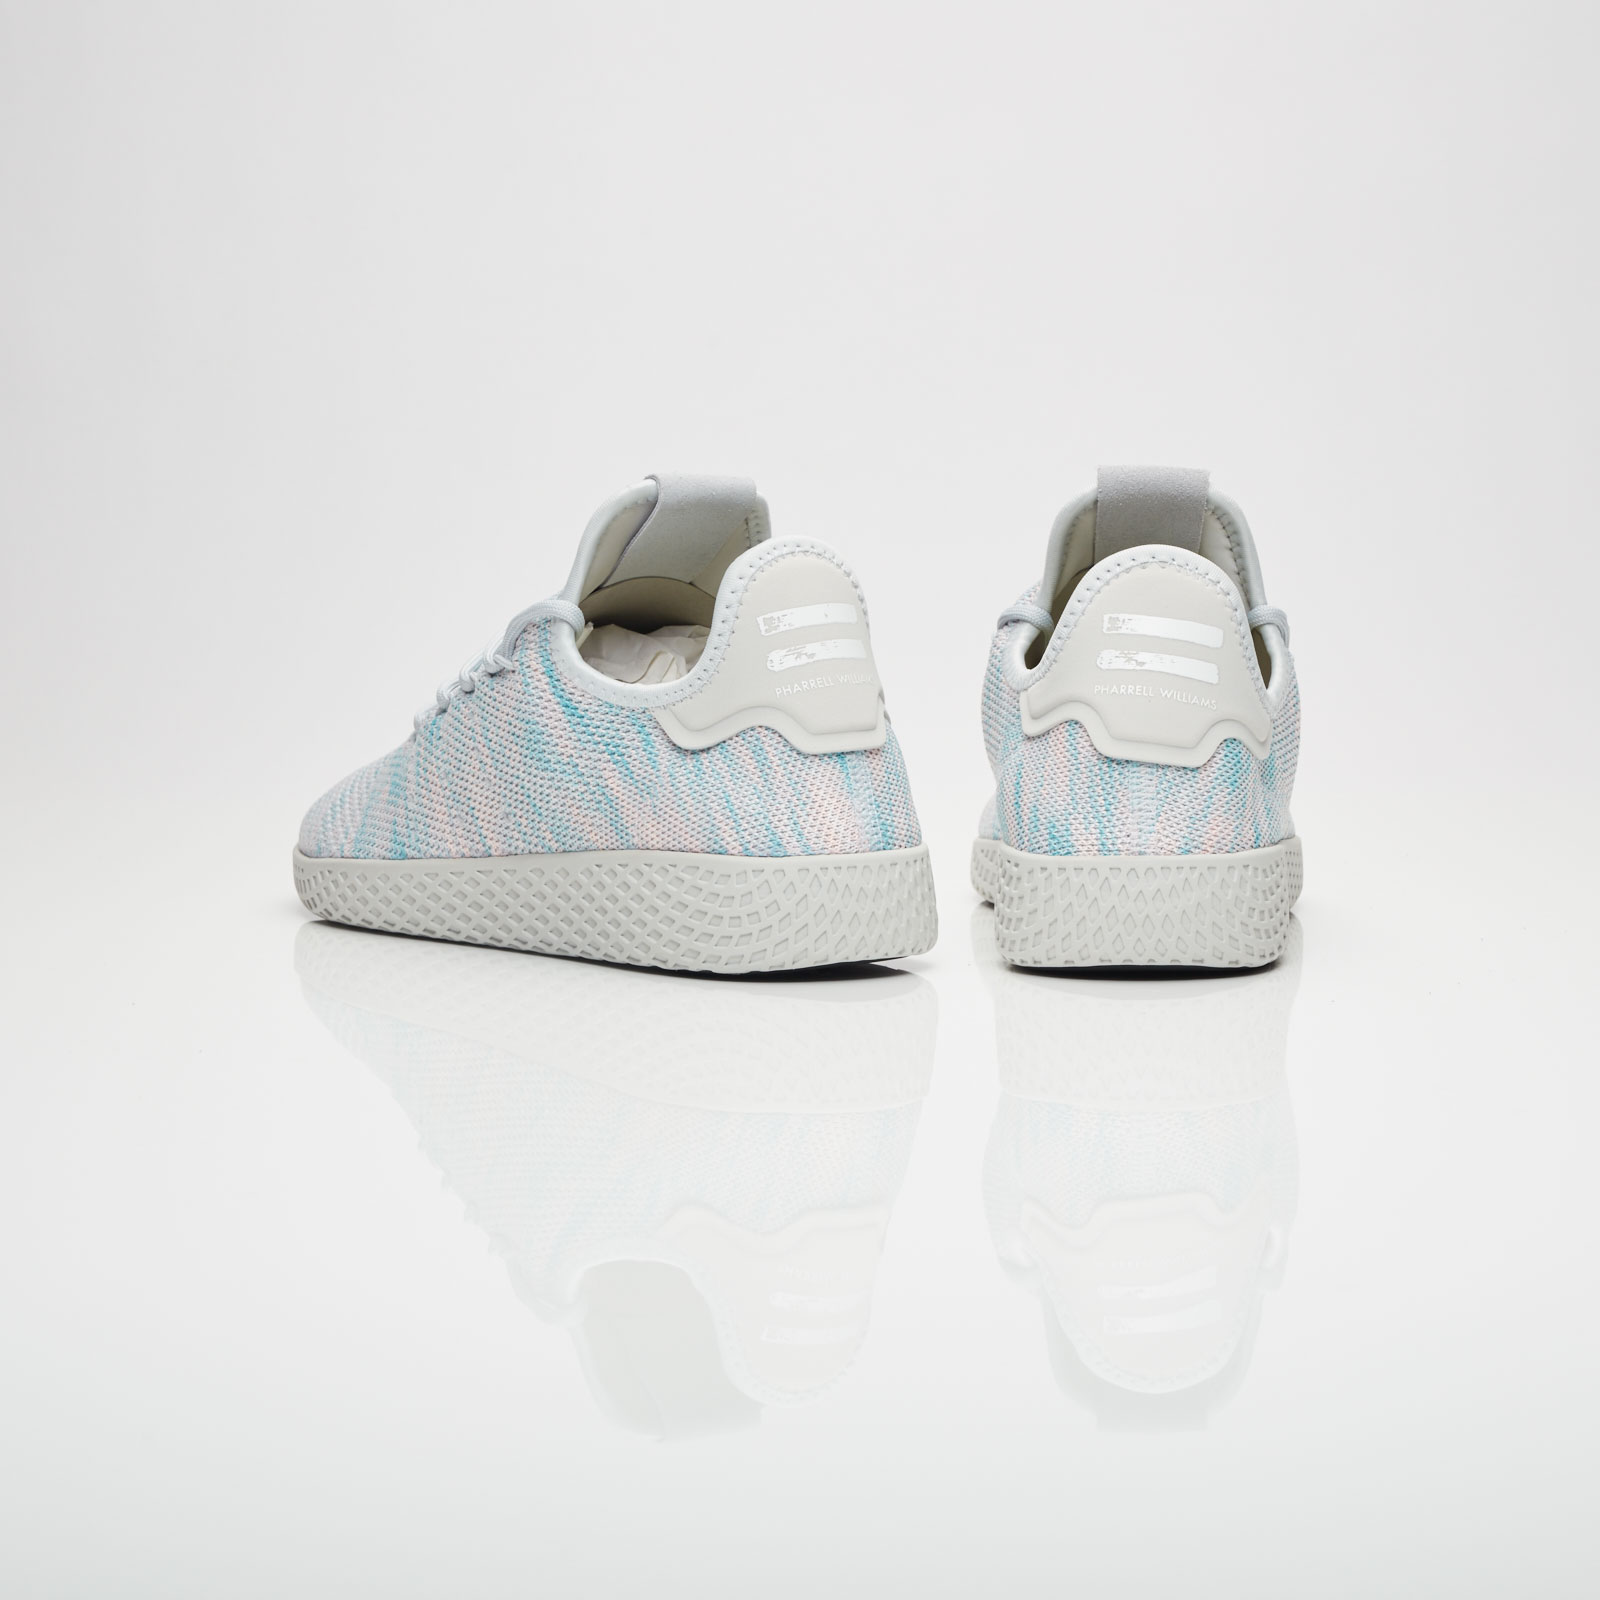 ca5820322 adidas Pharrell Williams Tennis HU - By2671 - Sneakersnstuff ...